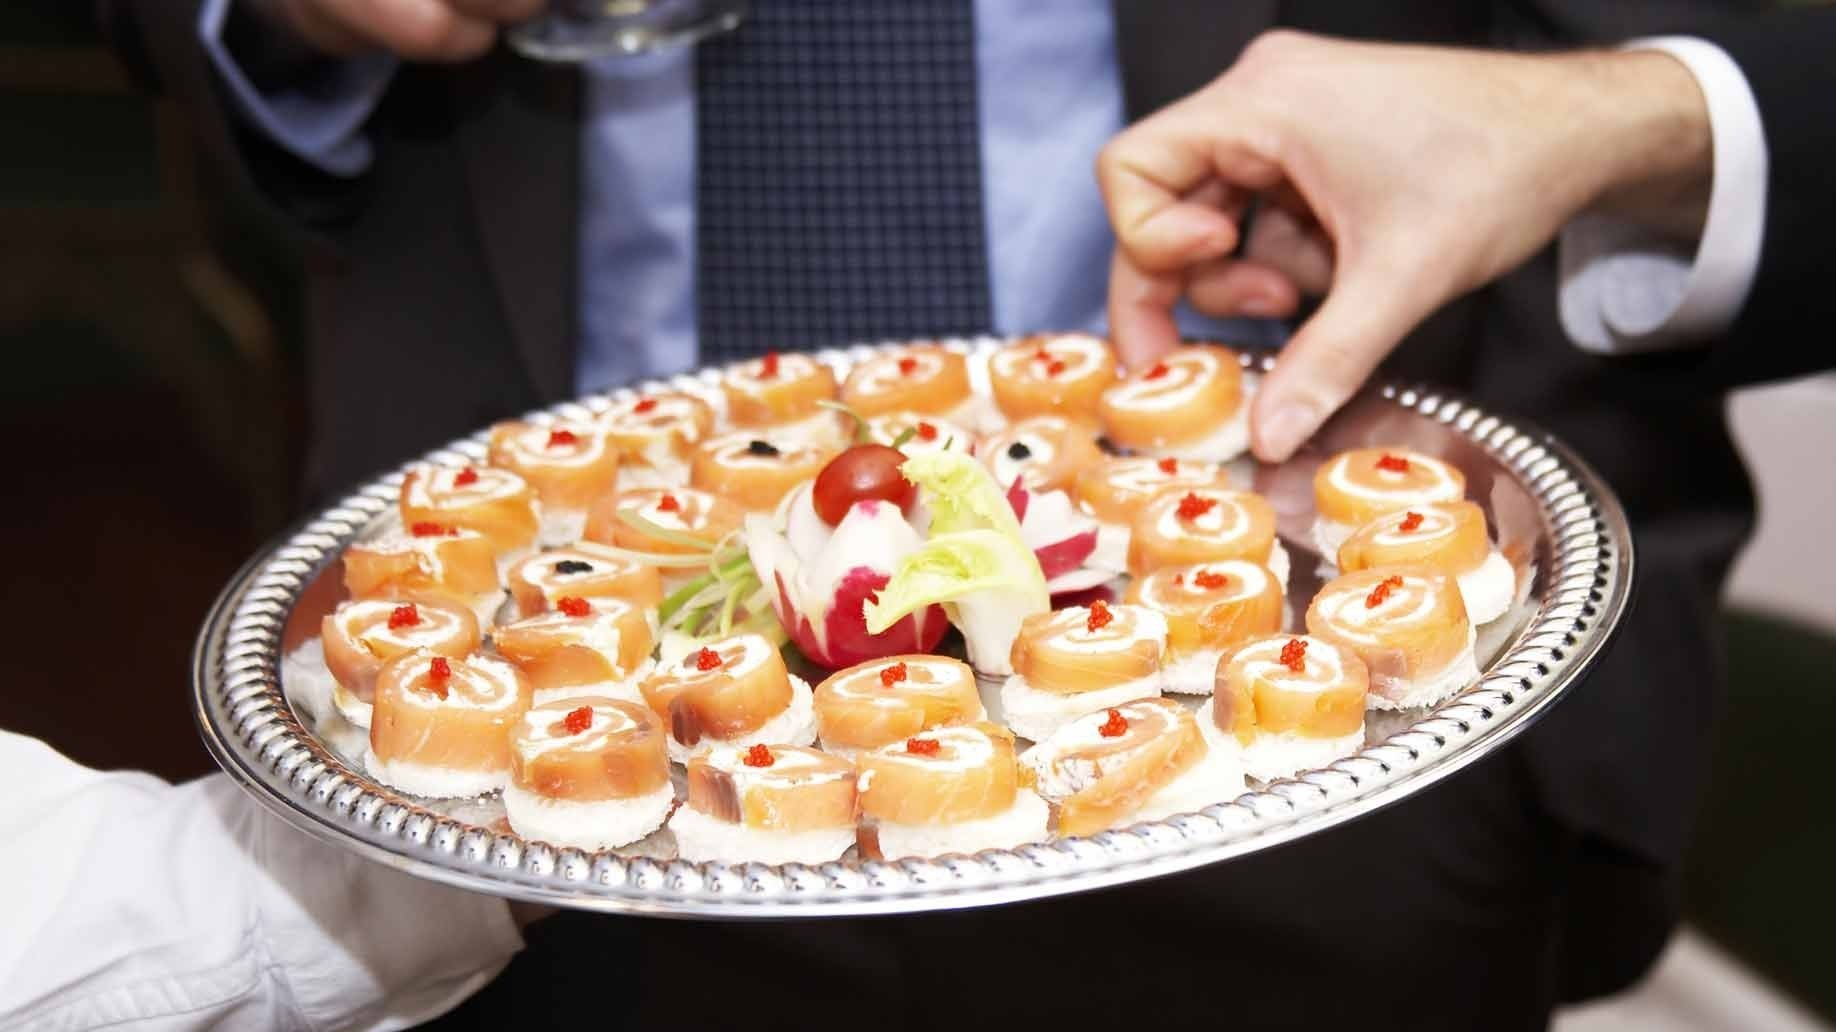 10 Attractive Cheap Wedding Reception Food Ideas 23 cheap wedding reception food drink menu ideas on a budget 9 2021